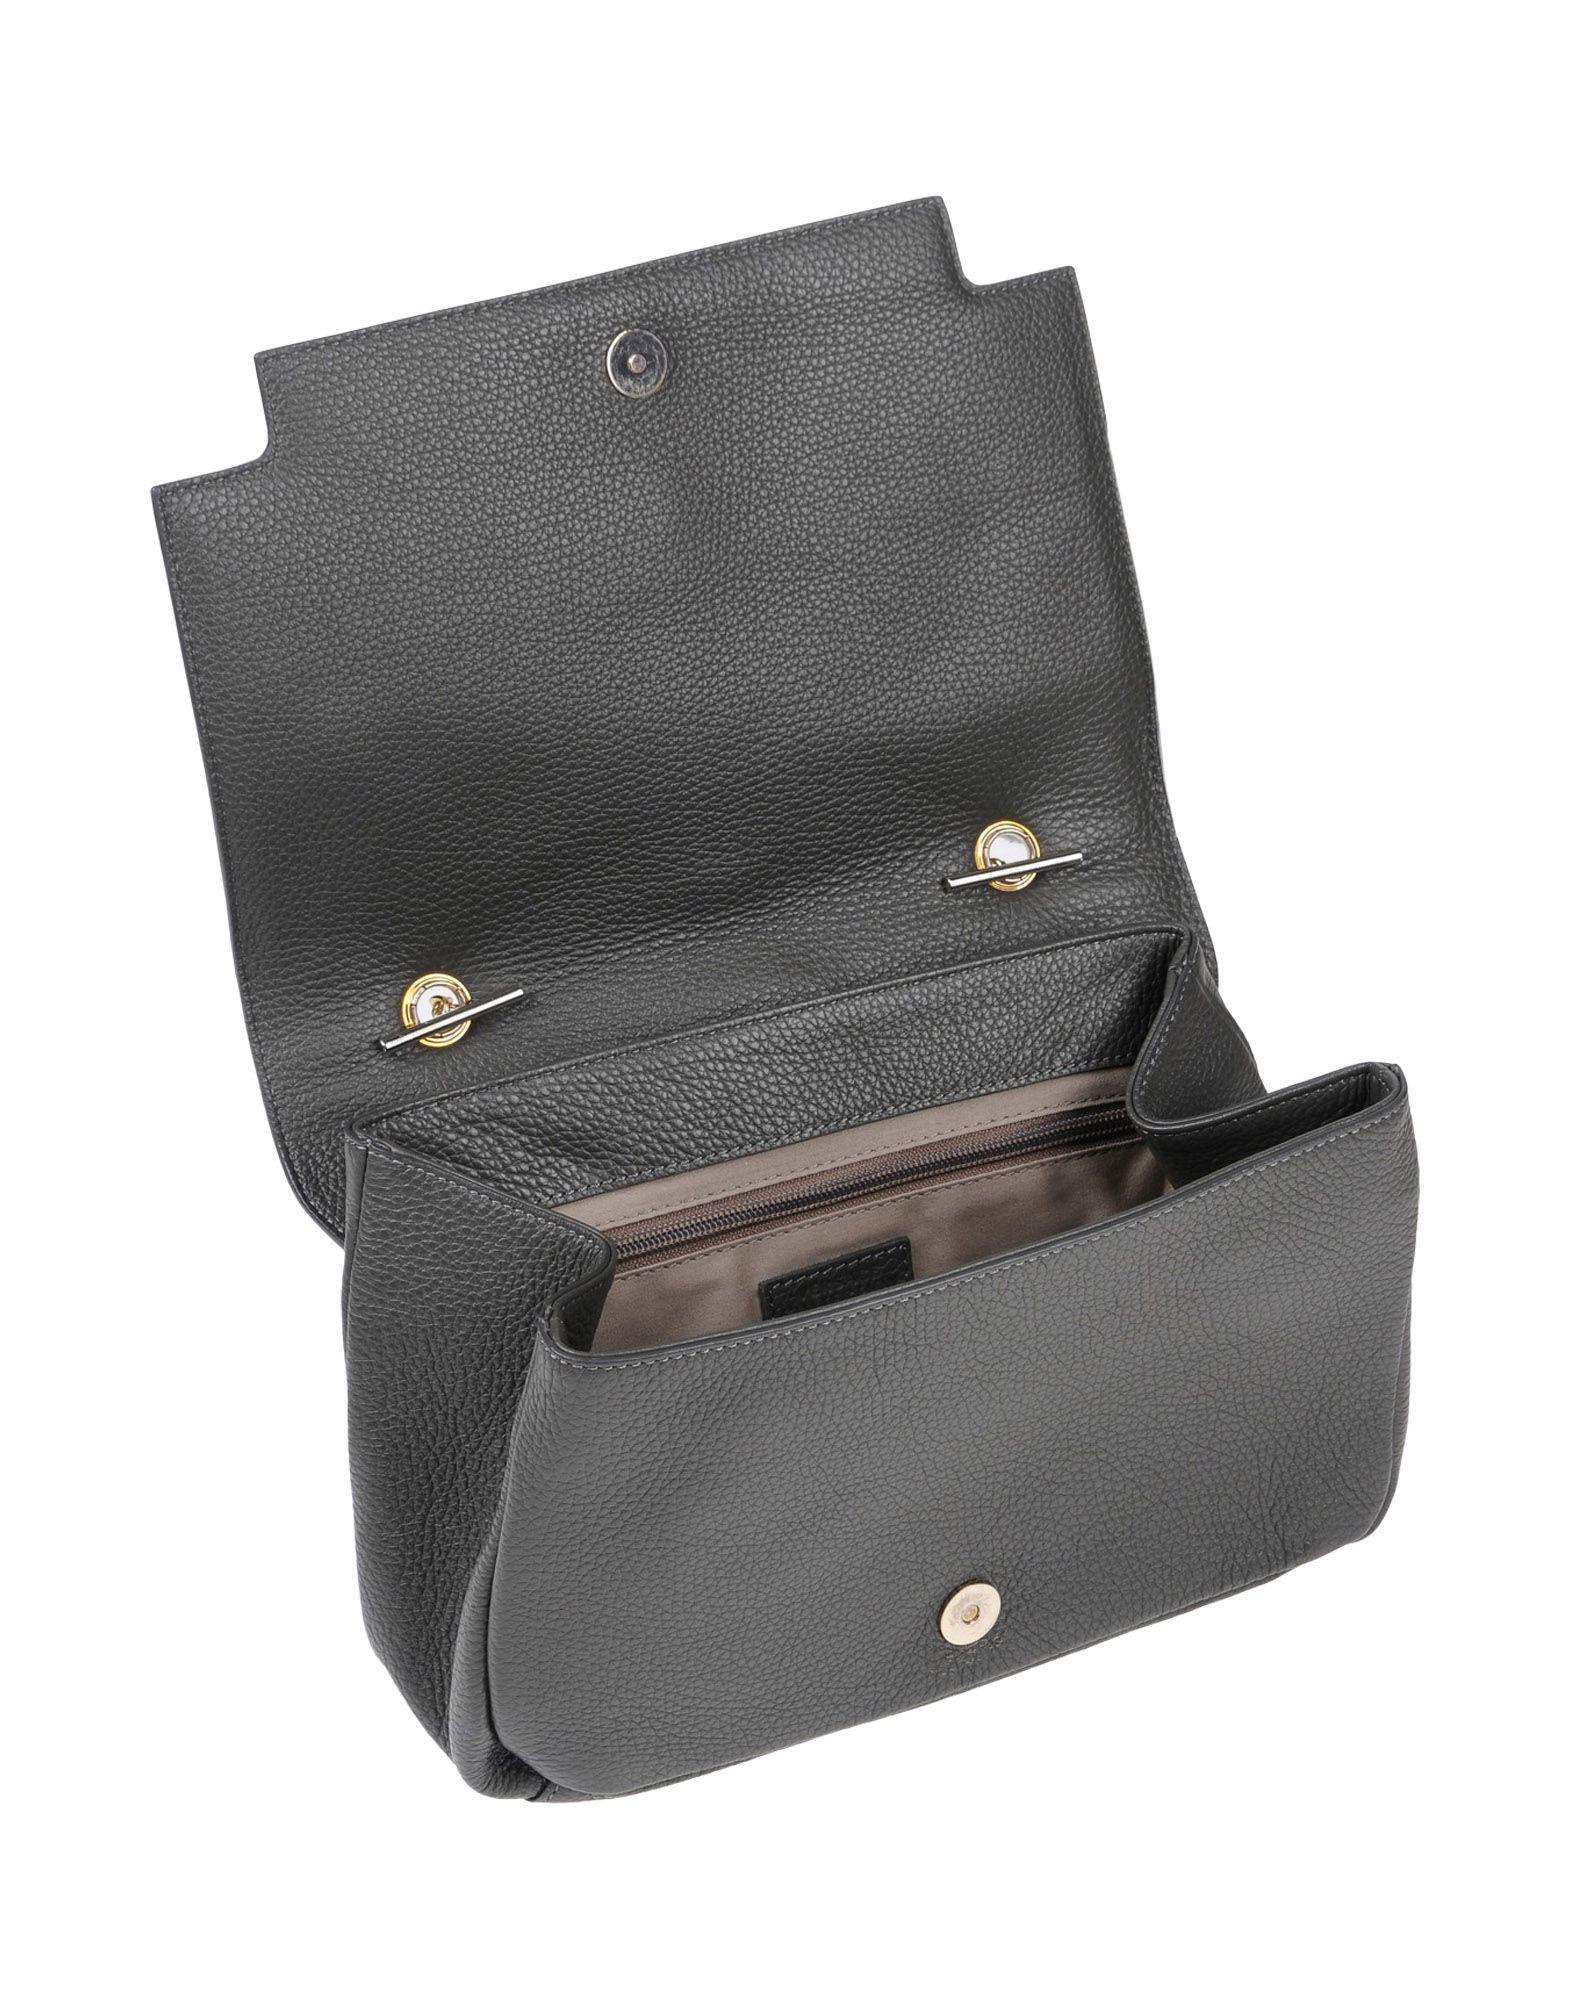 Versace Leather Cross-body Bag in Grey (Grey)